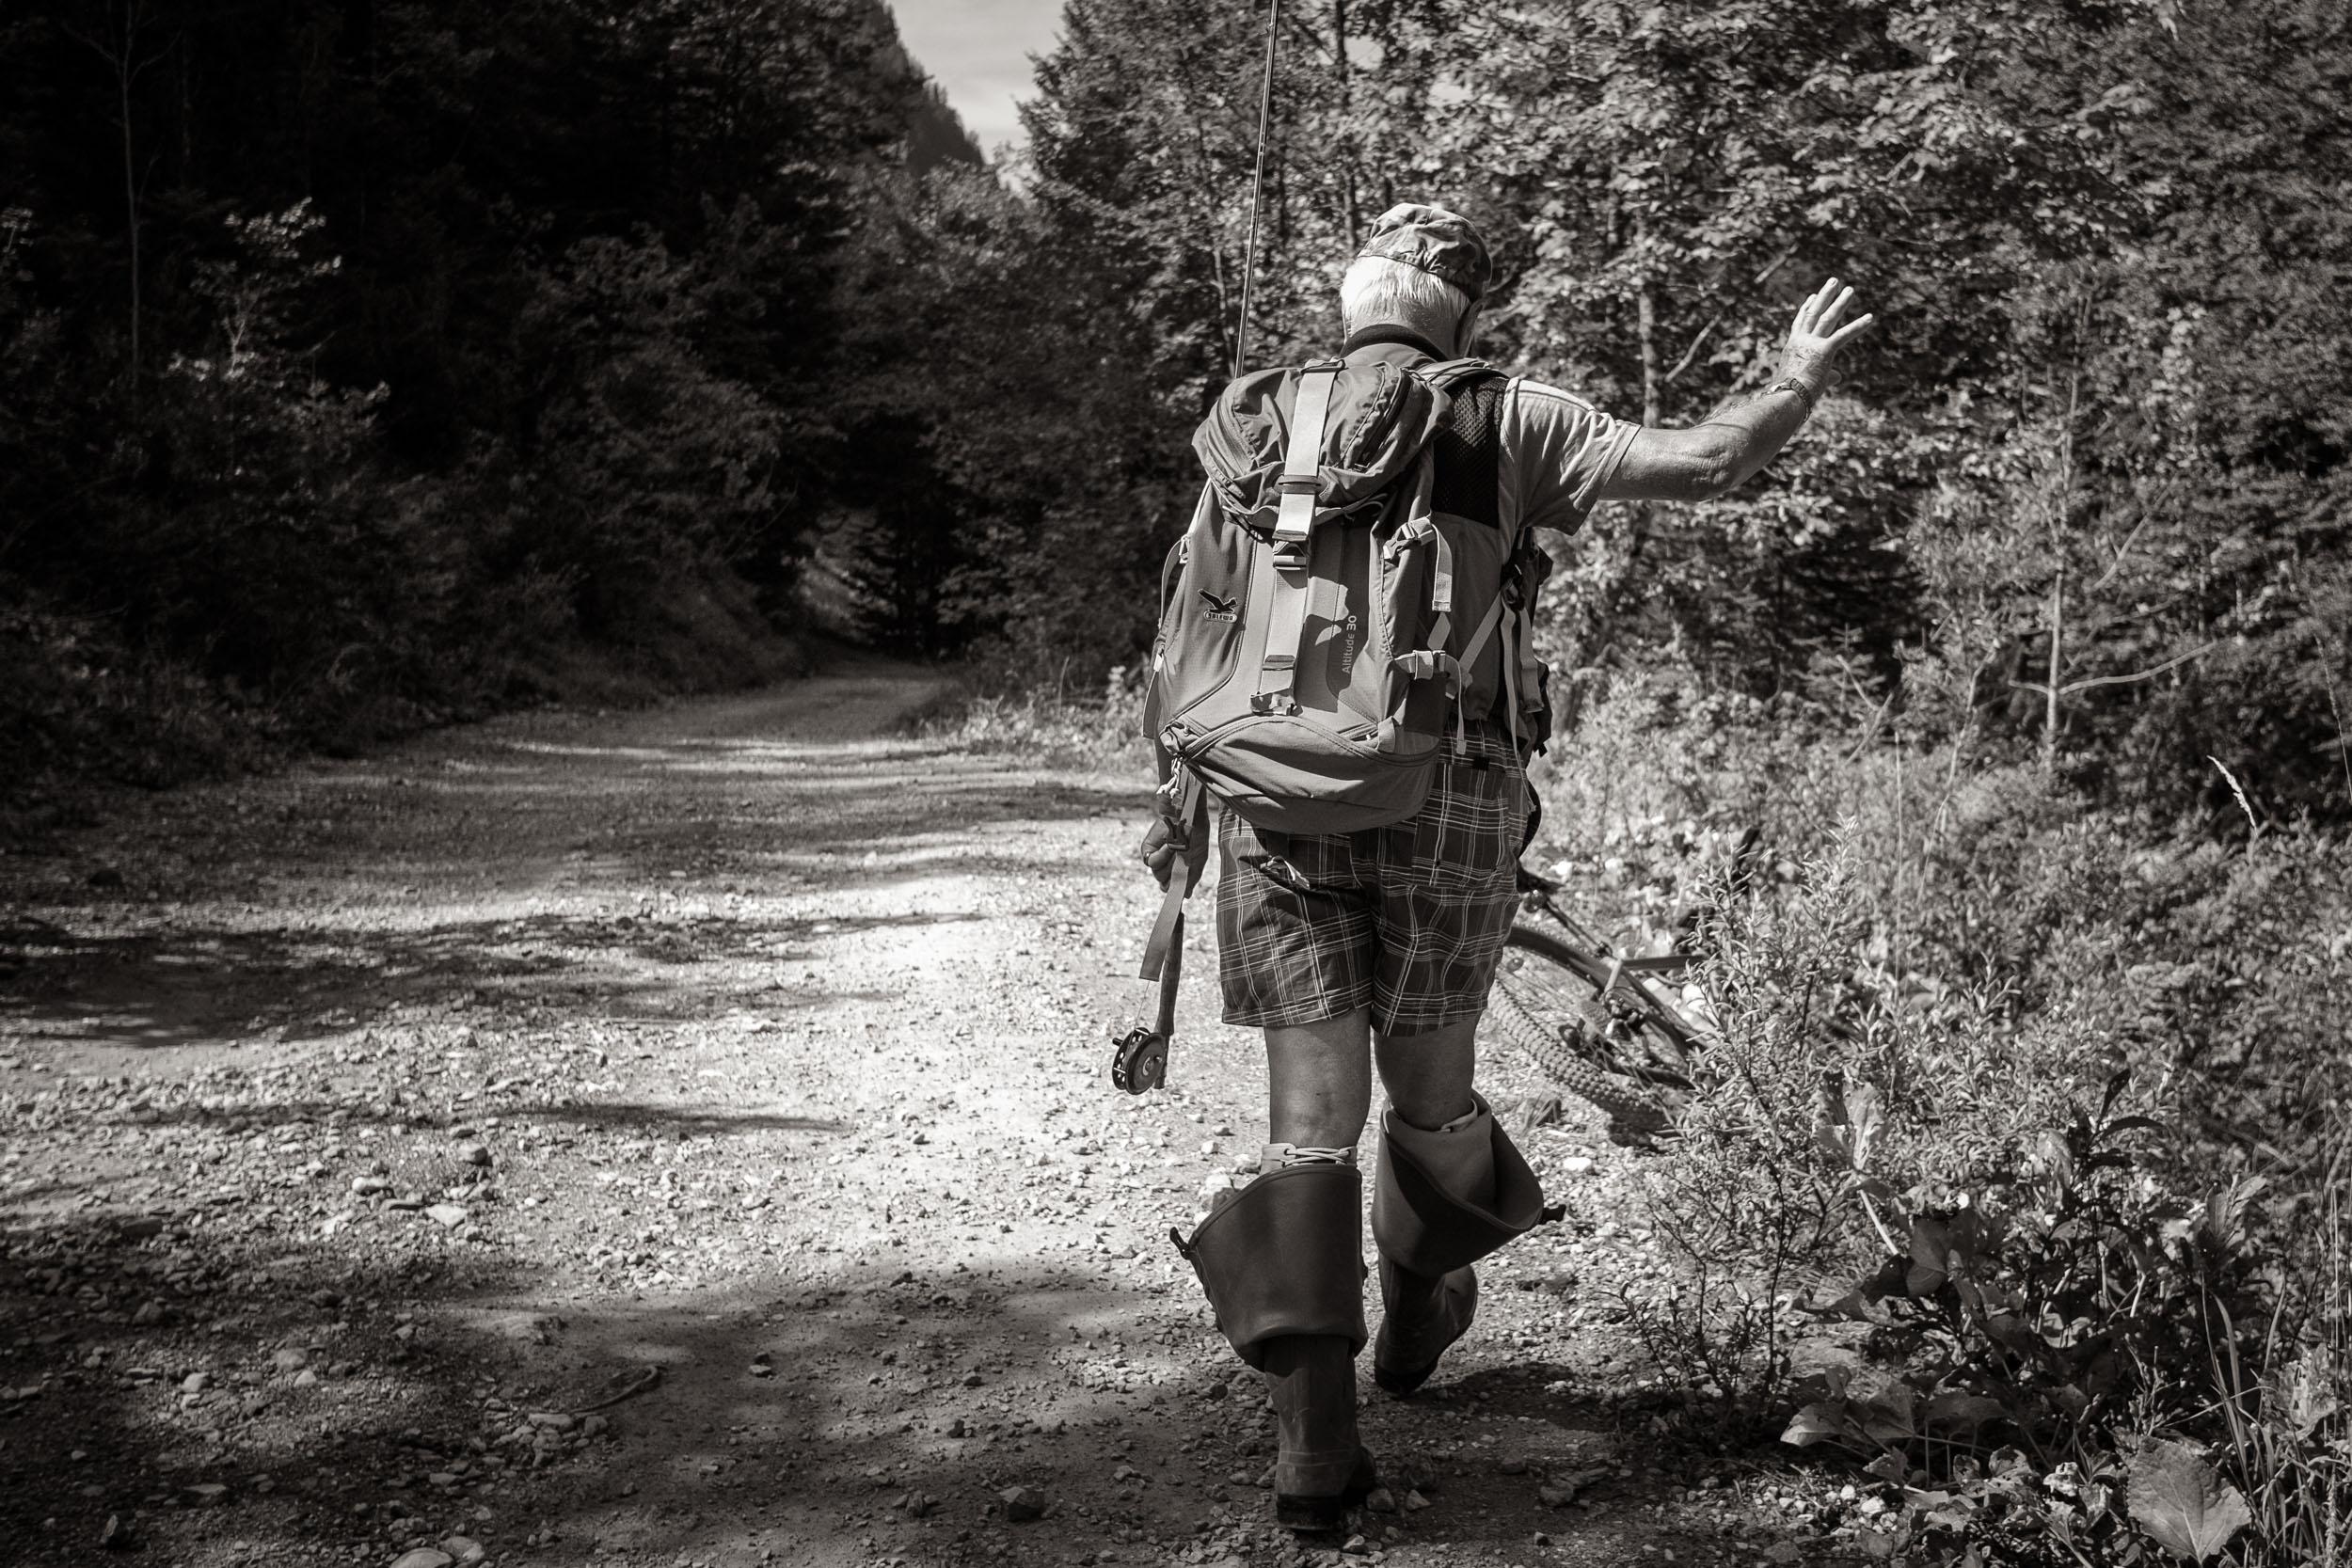 Angler am Lutzbach, Großes Walsertal